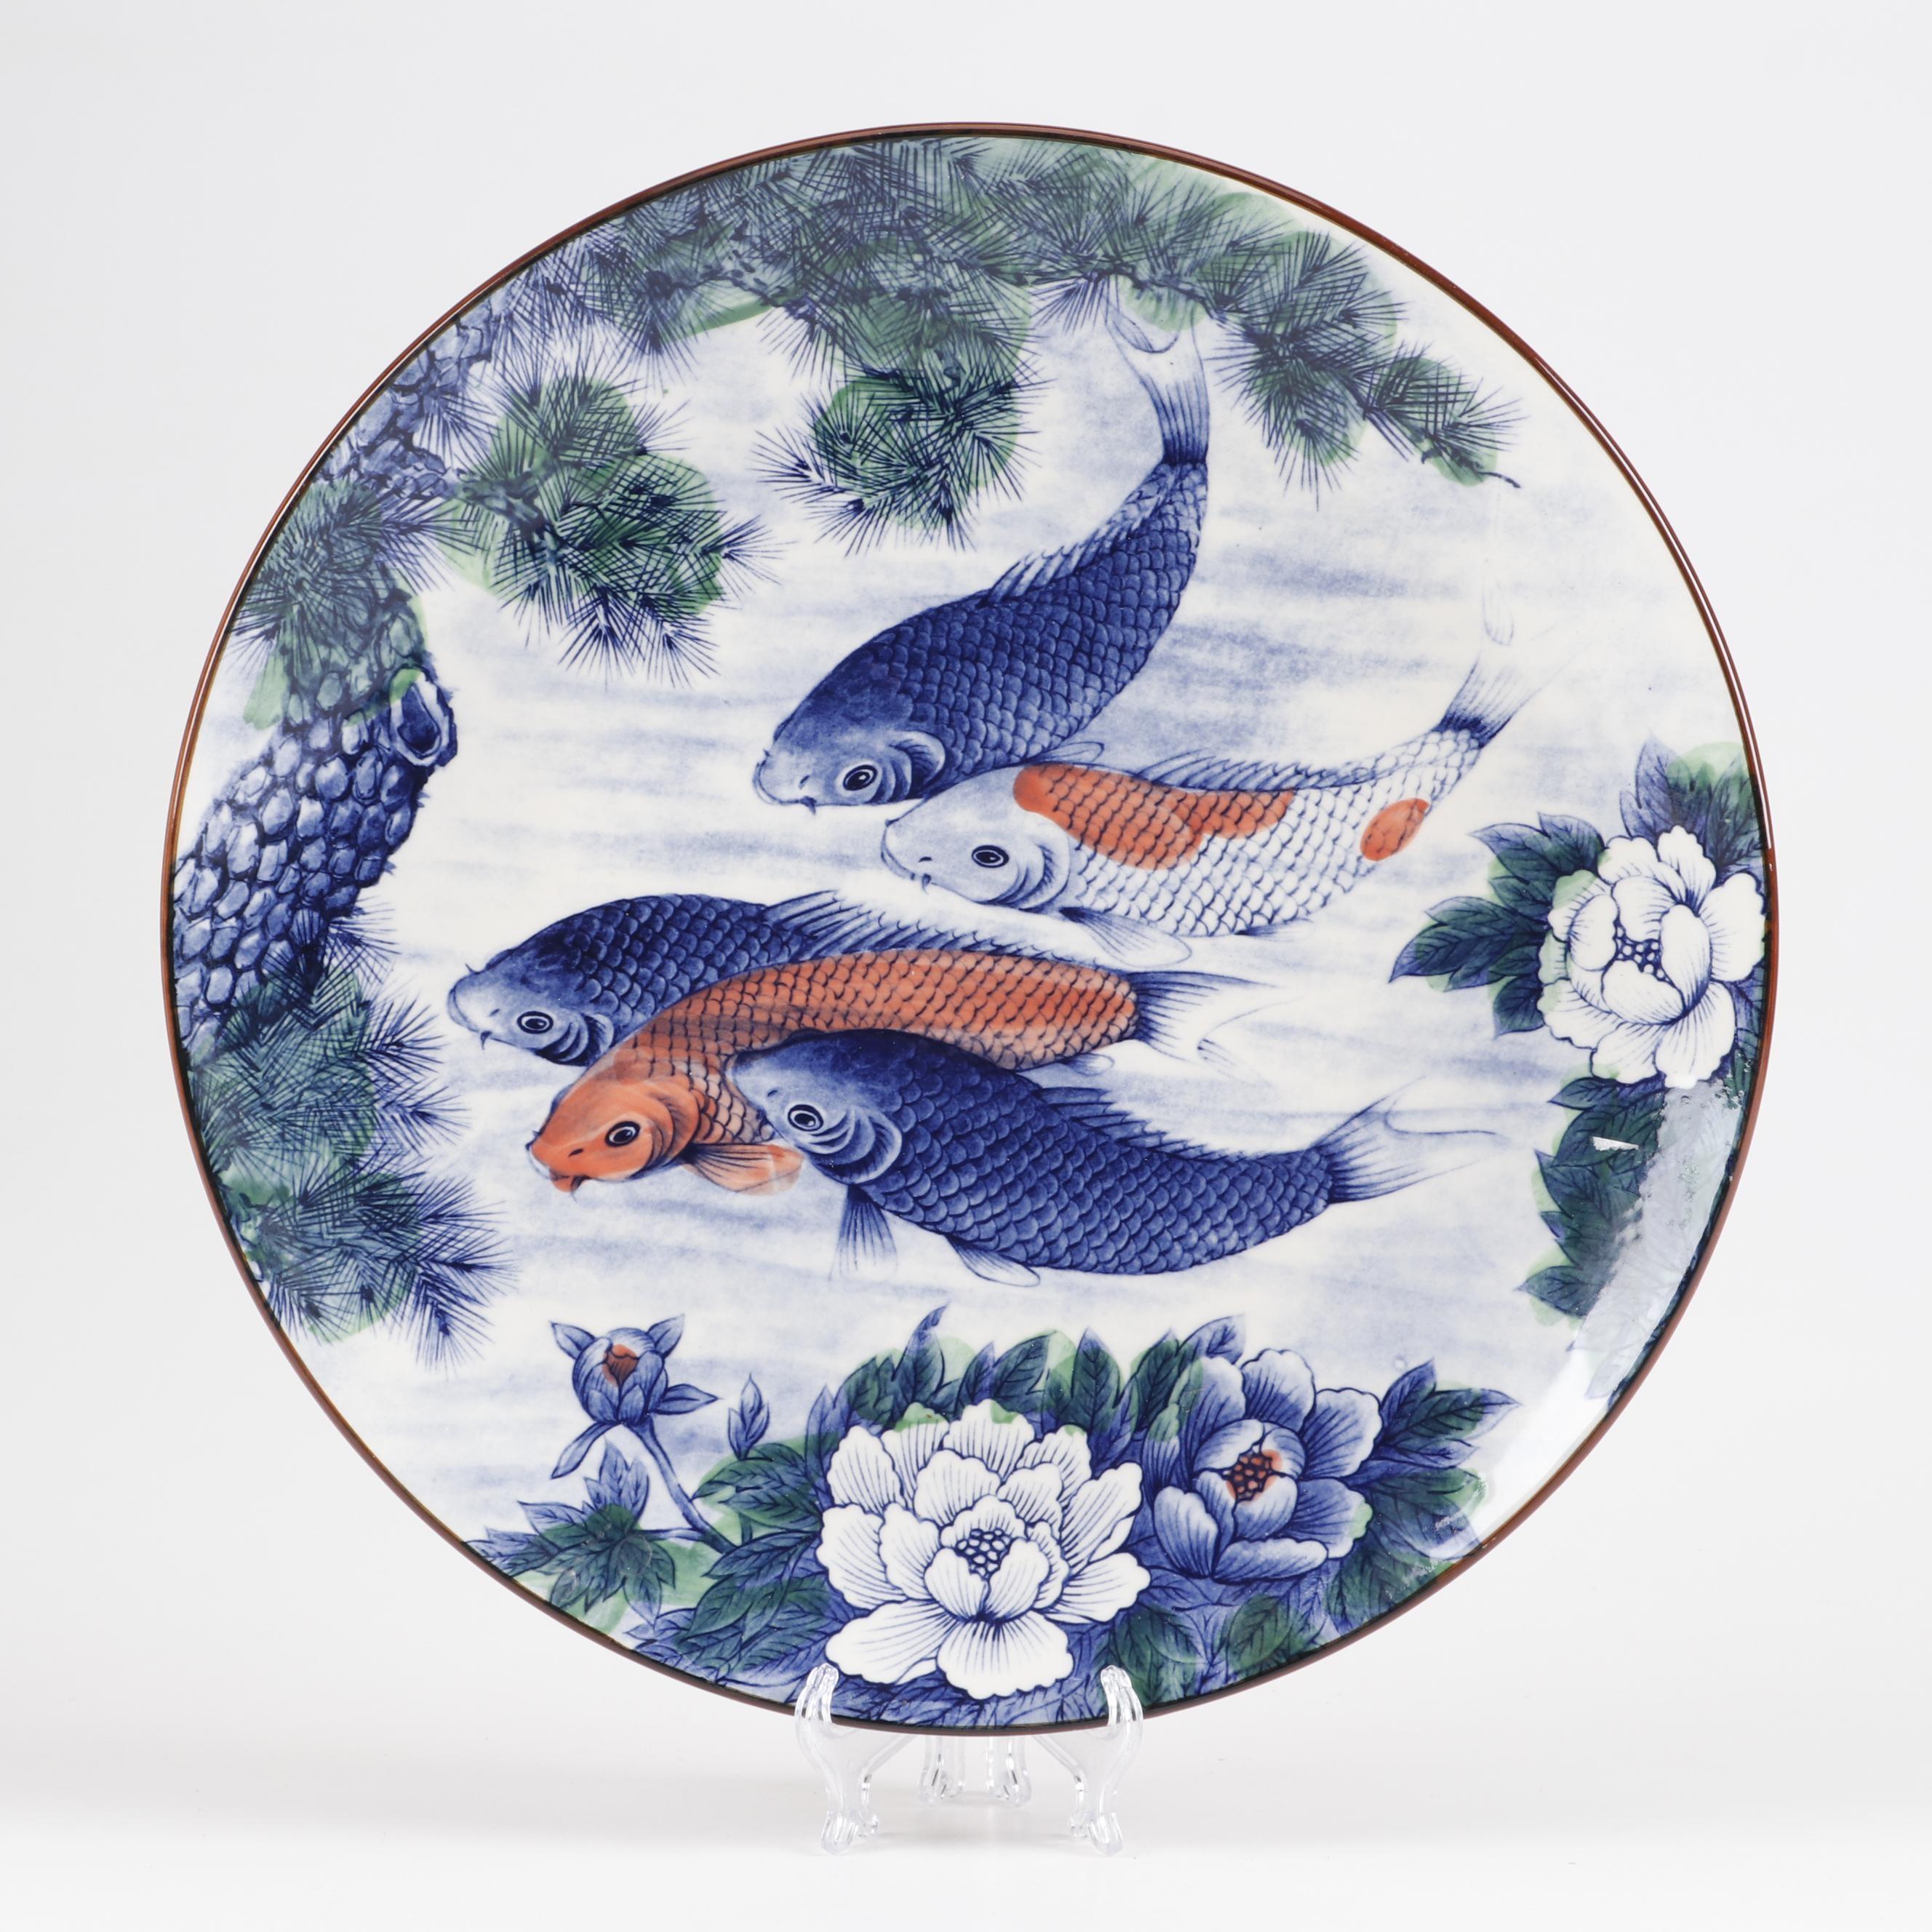 Japanese Hand-Embellished Transferware Ceramic Bowl Depicting Koi Fish